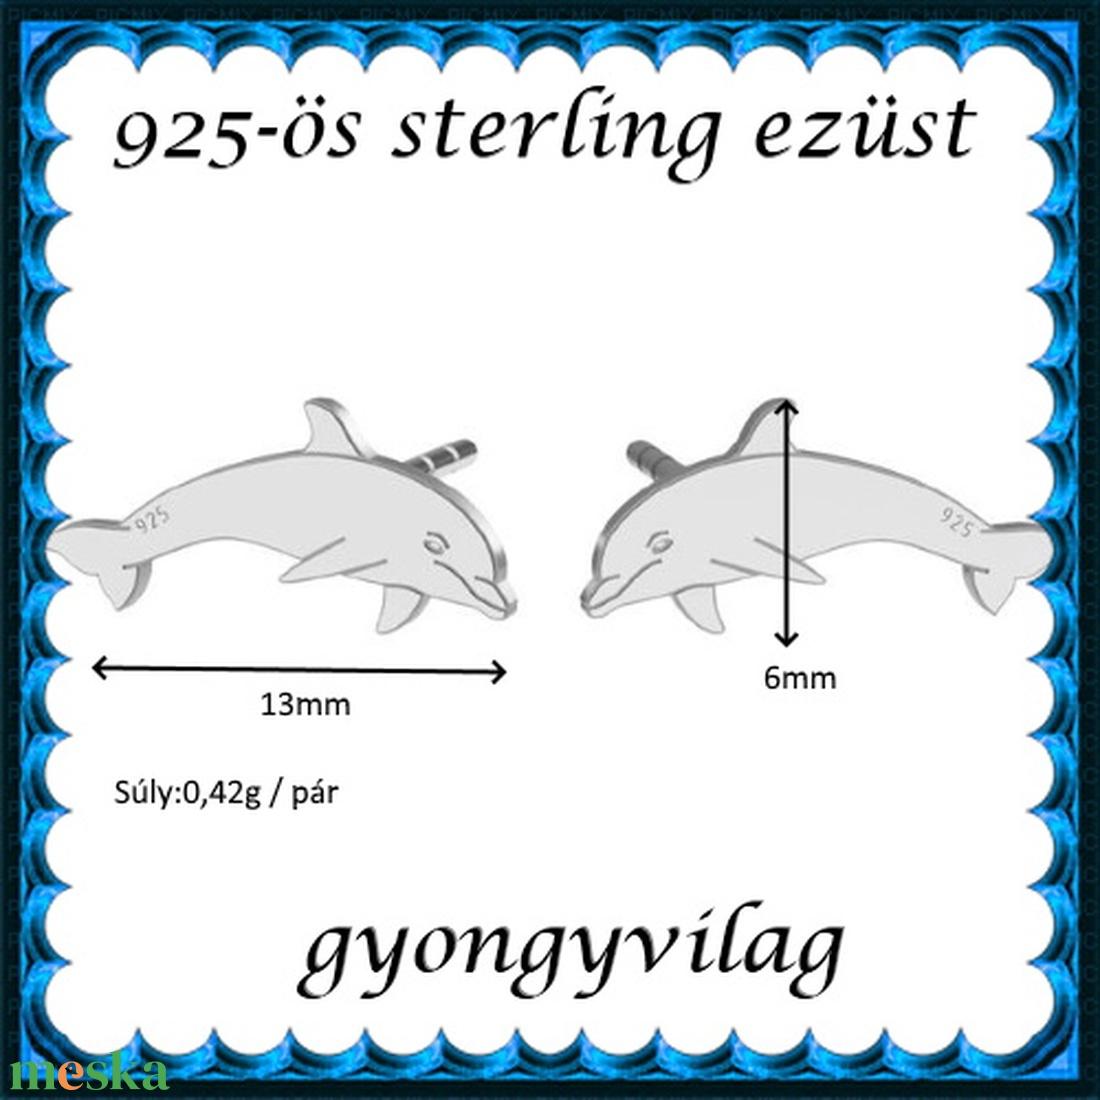 925-ös sterling ezüst: fülbevaló  EF 09 - ékszer - fülbevaló - pötty fülbevaló - Meska.hu